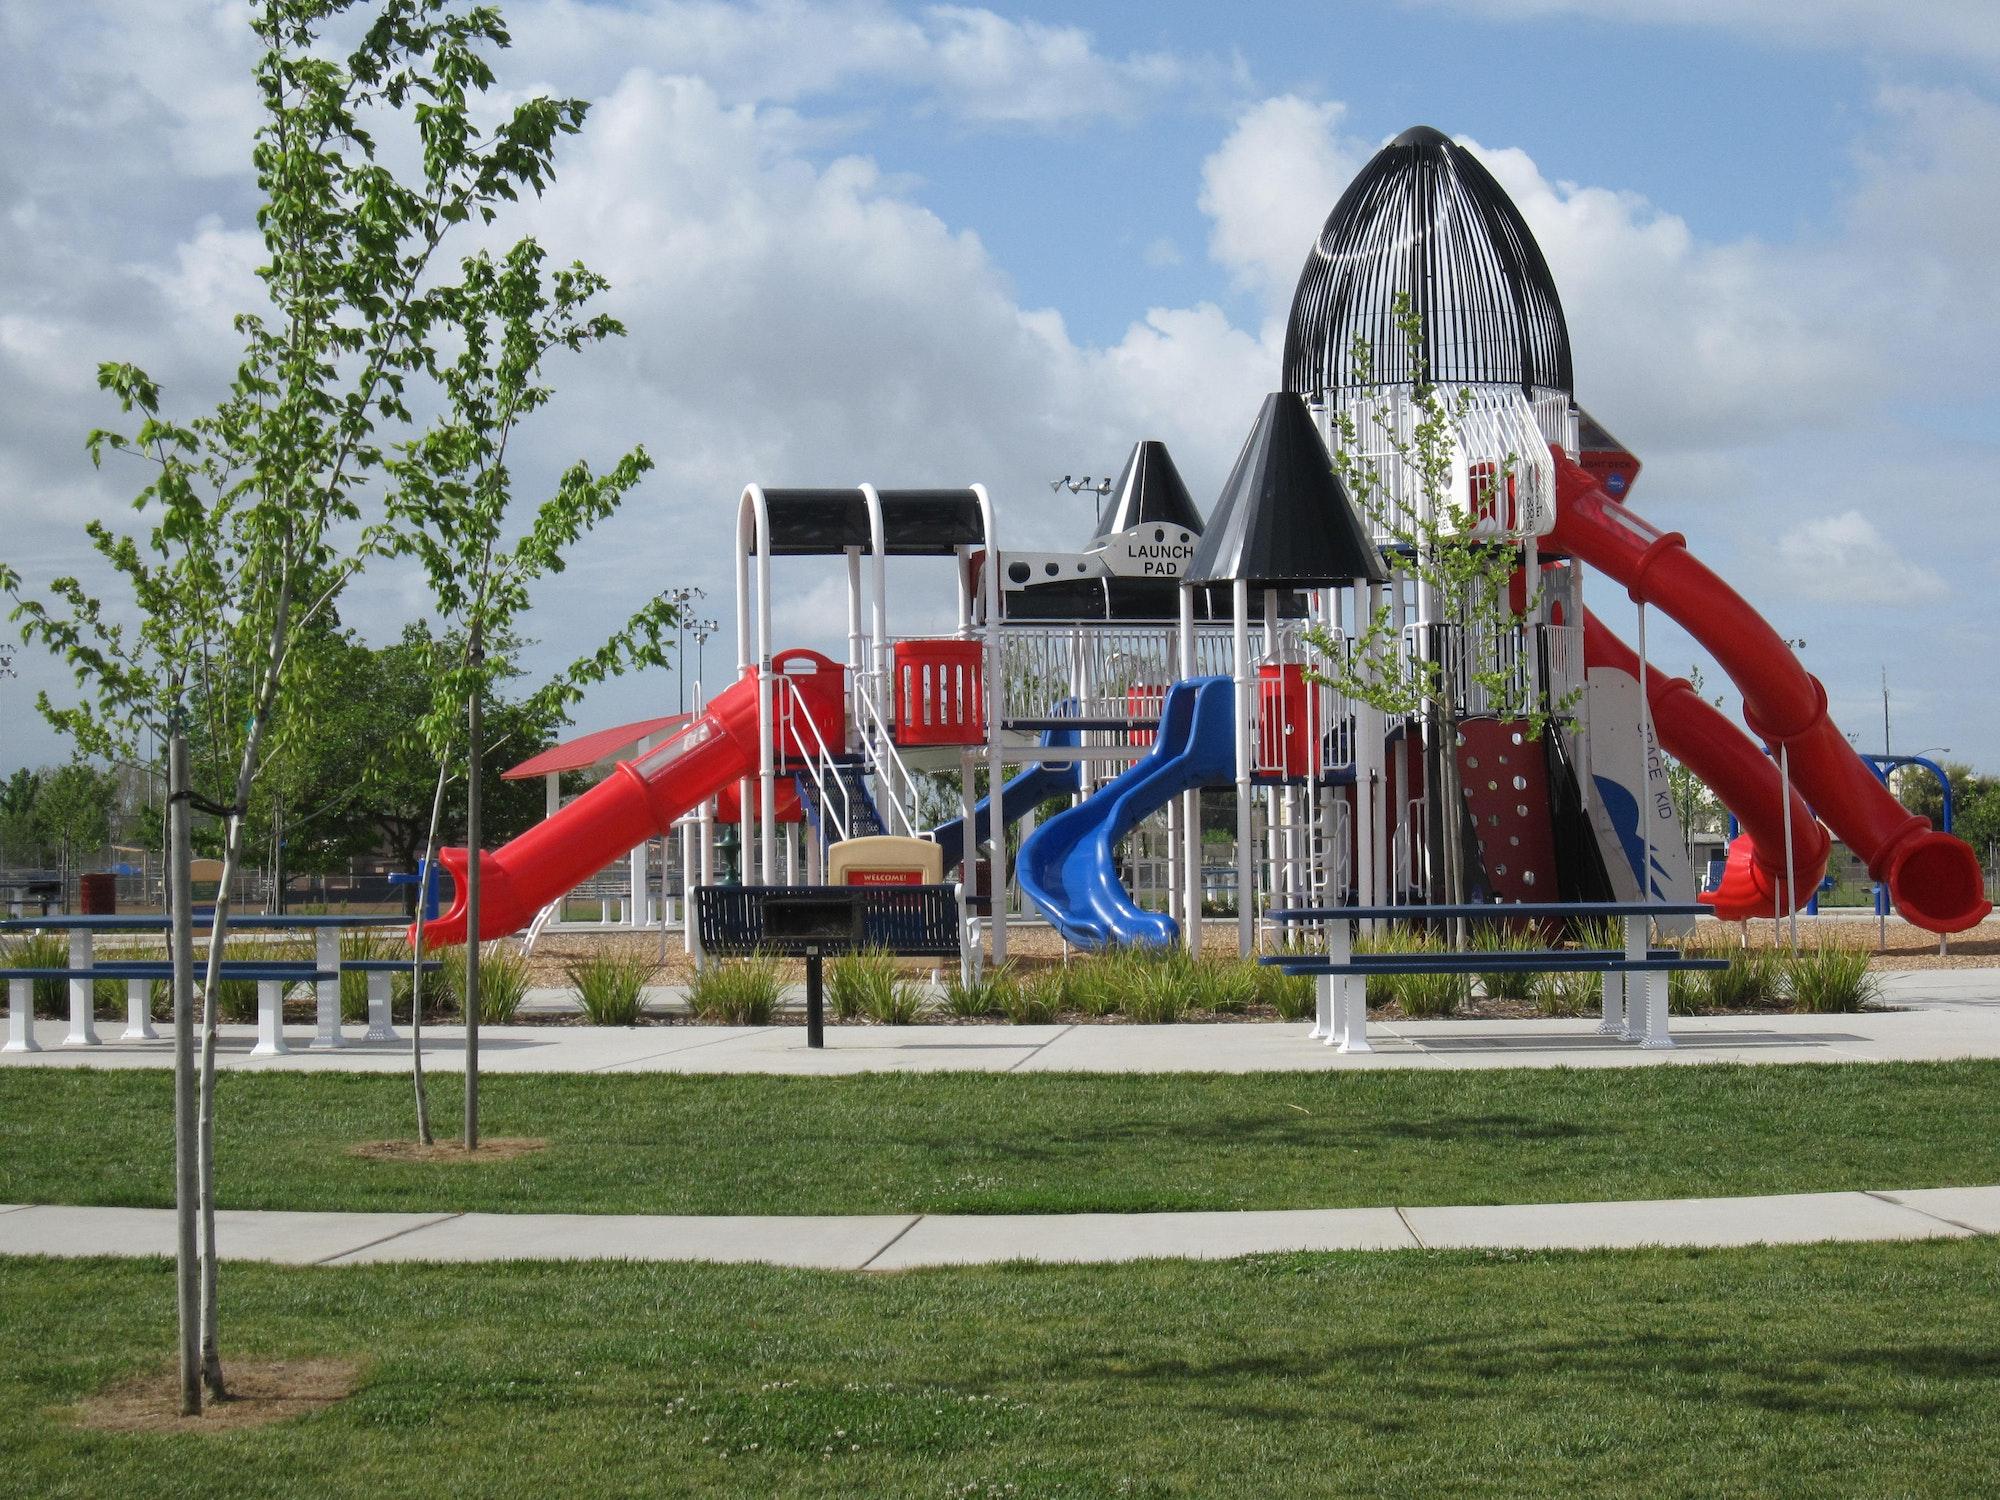 Freedom Park playground